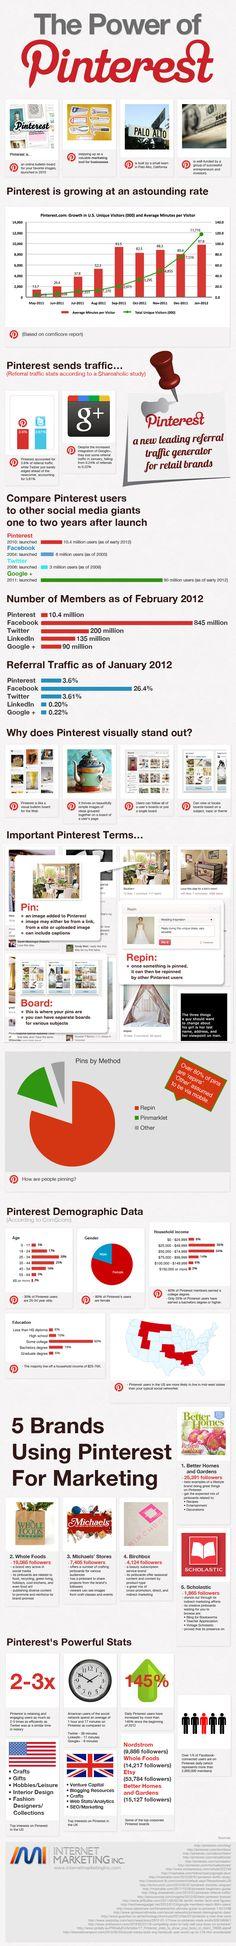 Pinterest Infographic  The power of Pinterest